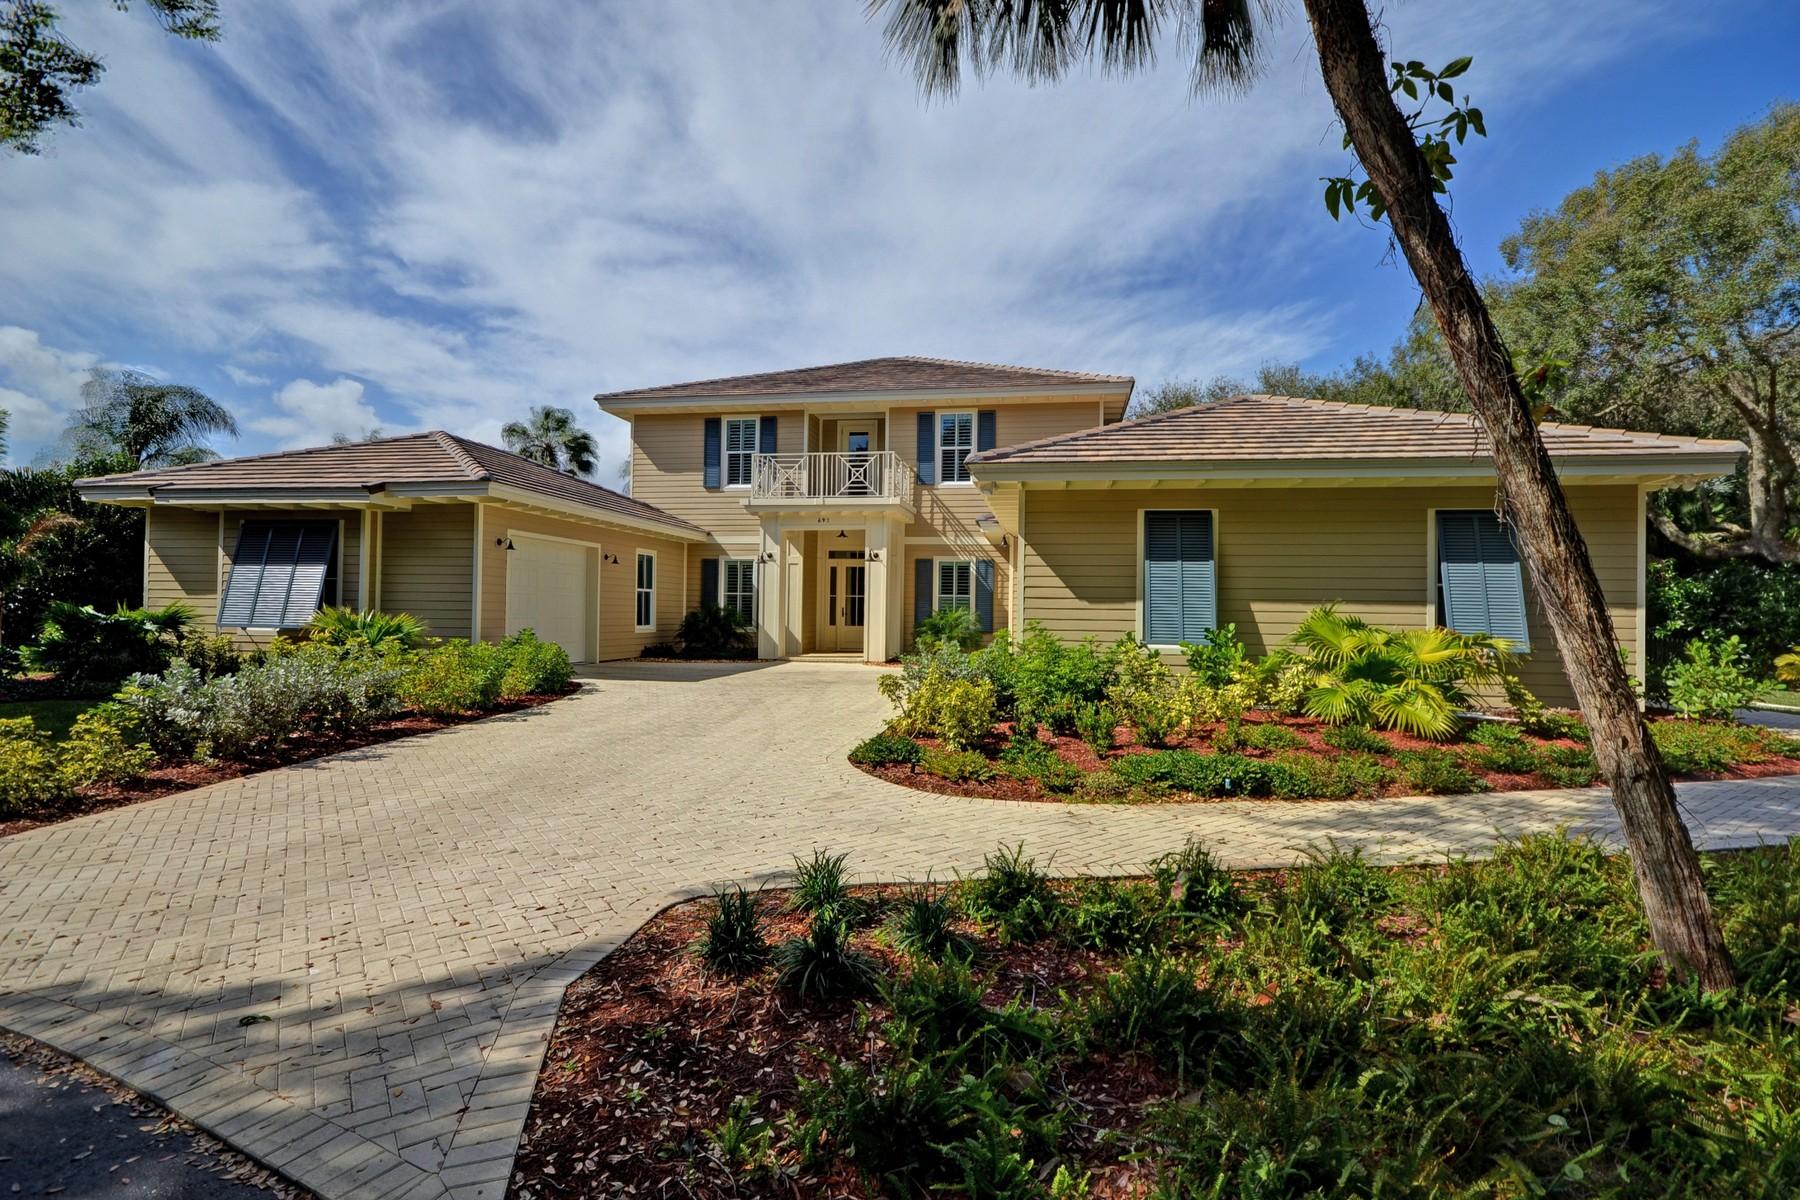 独户住宅 为 销售 在 Superb New Custom Built Home in Indian Triails 691 N Tomahawk Trl 维罗海滩, 佛罗里达州, 32963 美国